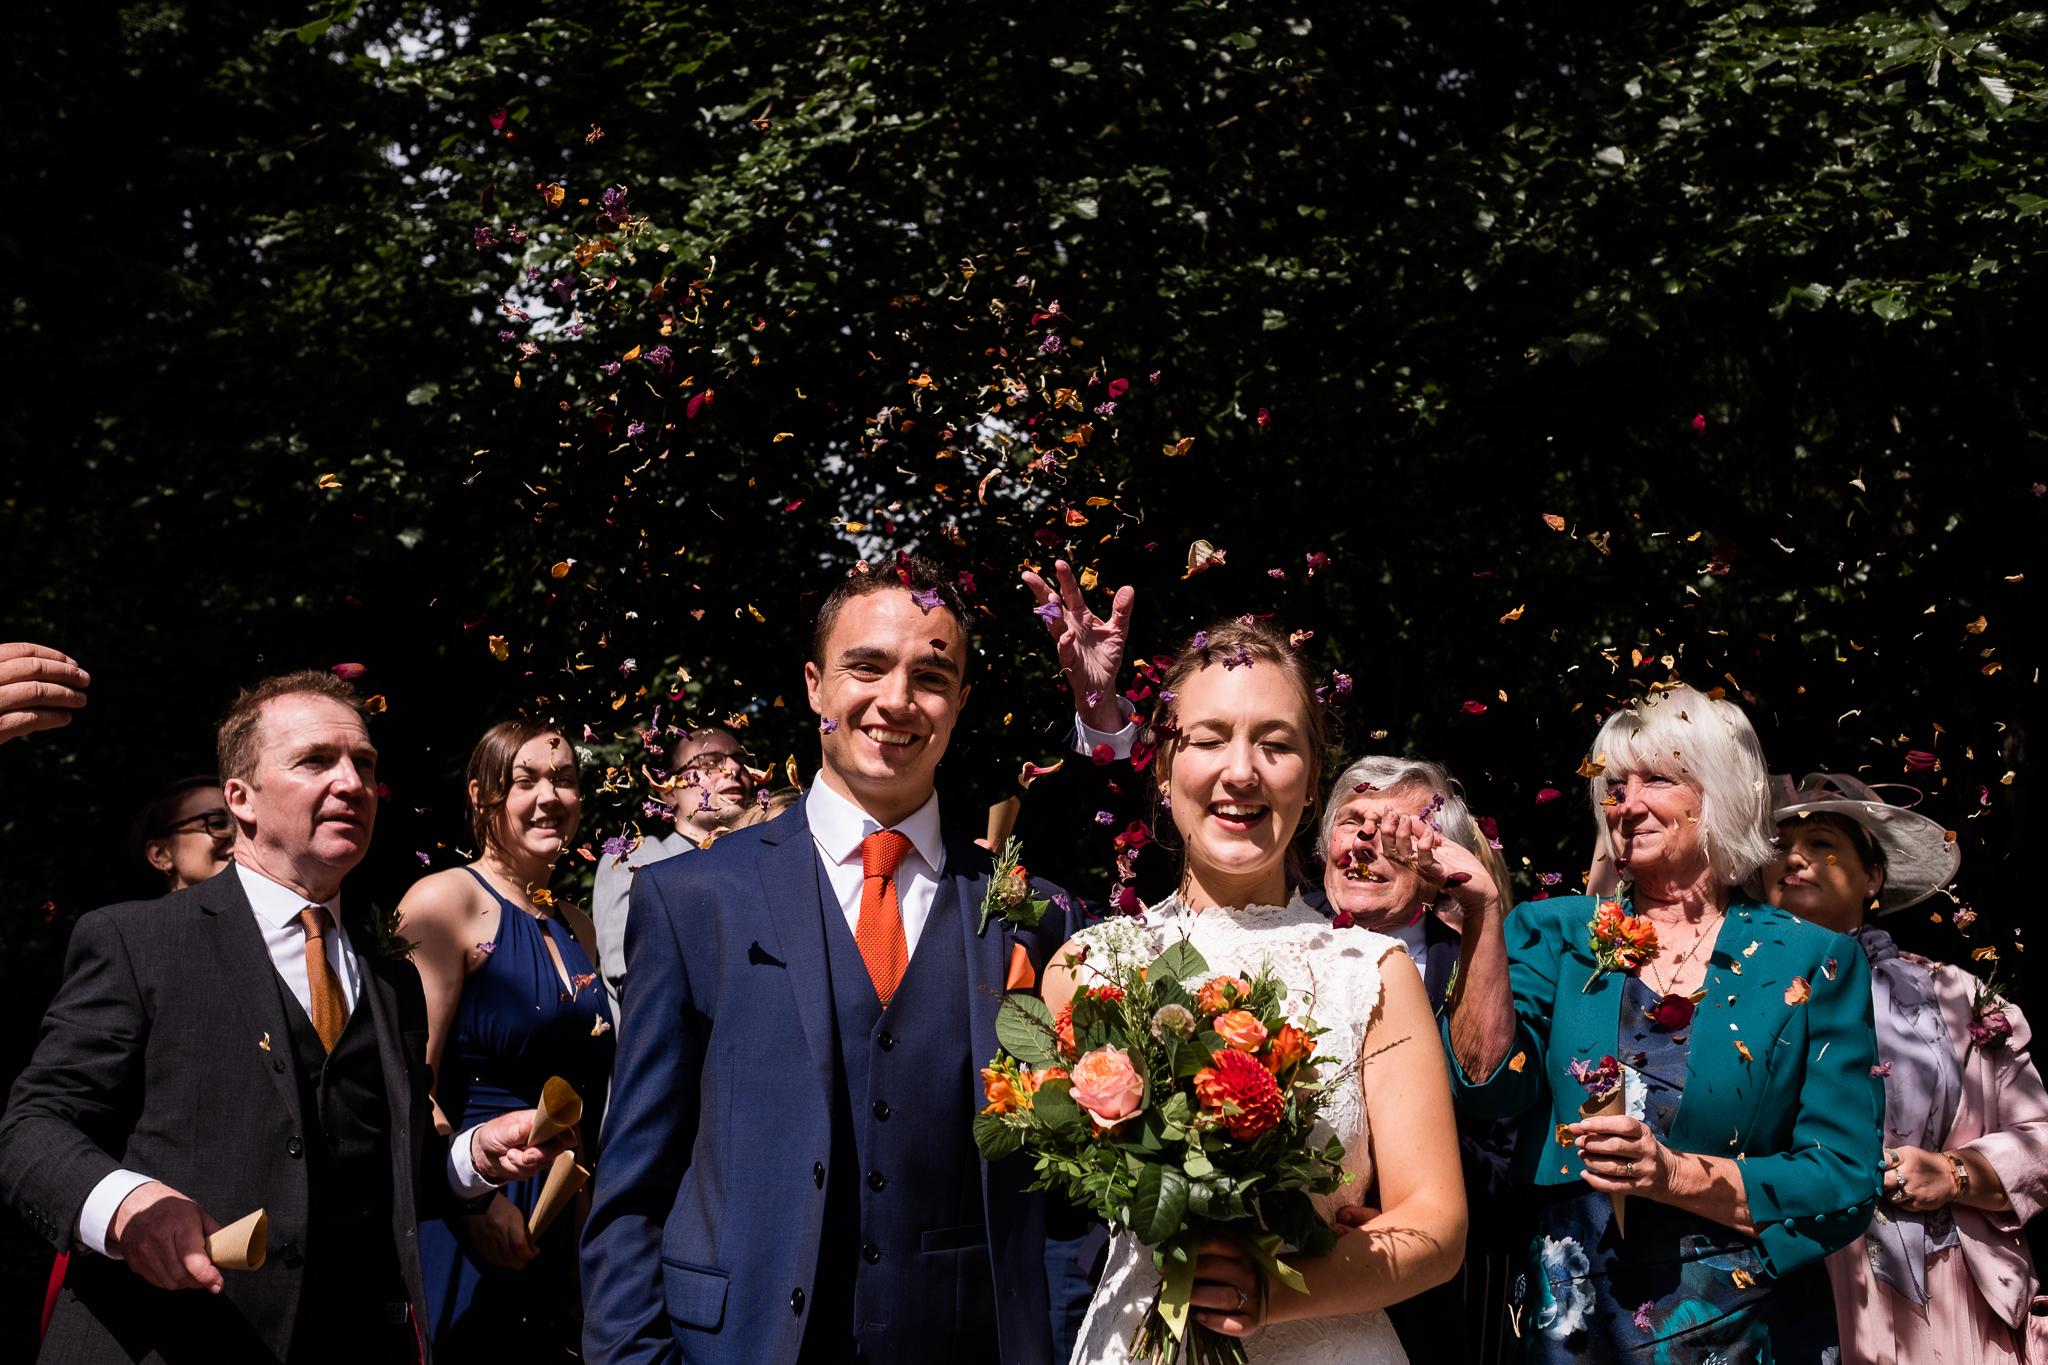 Relaxed Documentary Wedding Photography at The Wizard Inn, Alderley Edge Cheshire - Jenny Harper-42.jpg